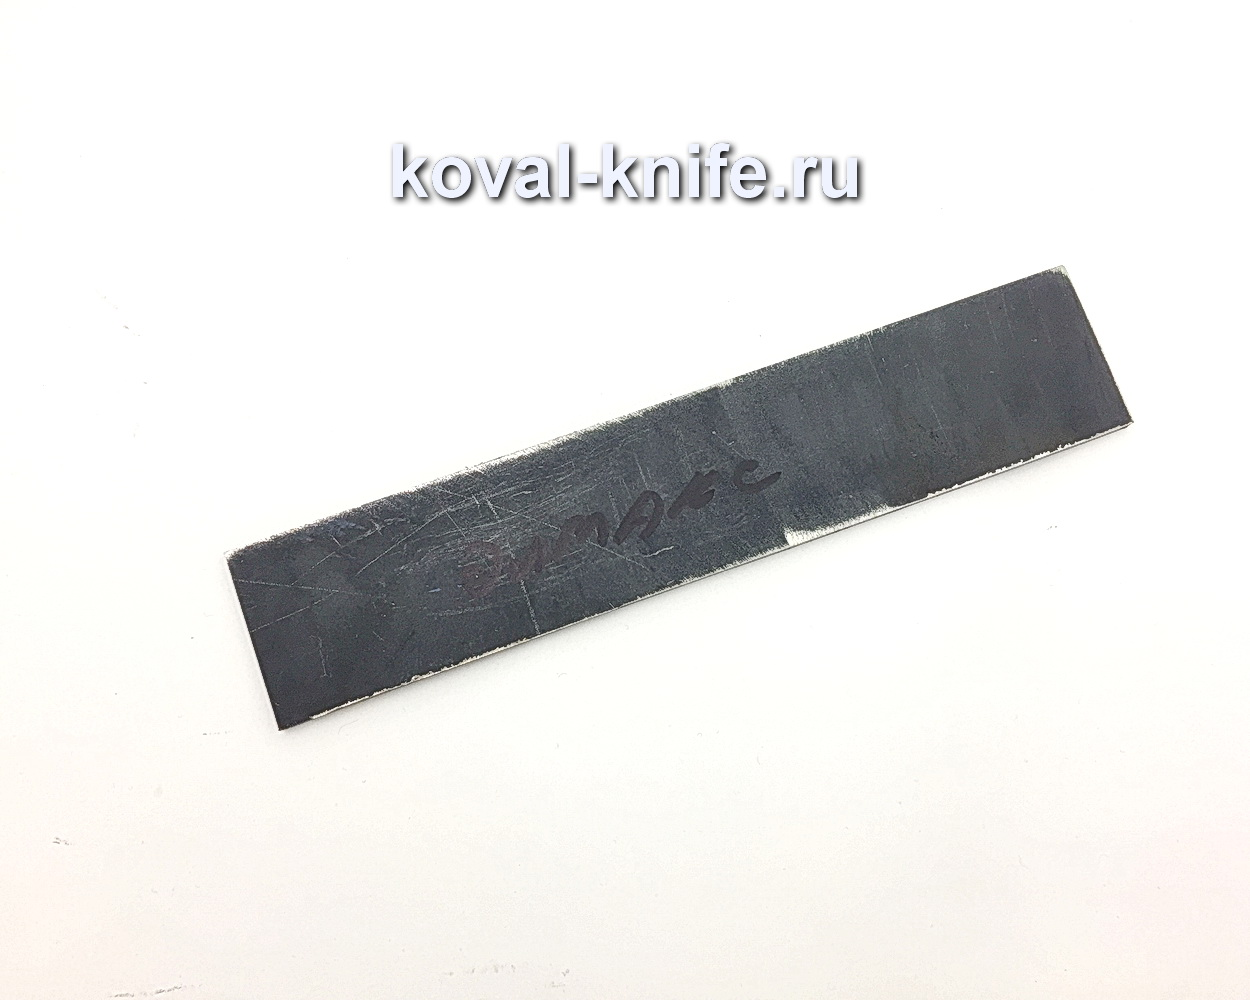 Заготовка из порошковой стали: Elmax 200х40х3,7мм.